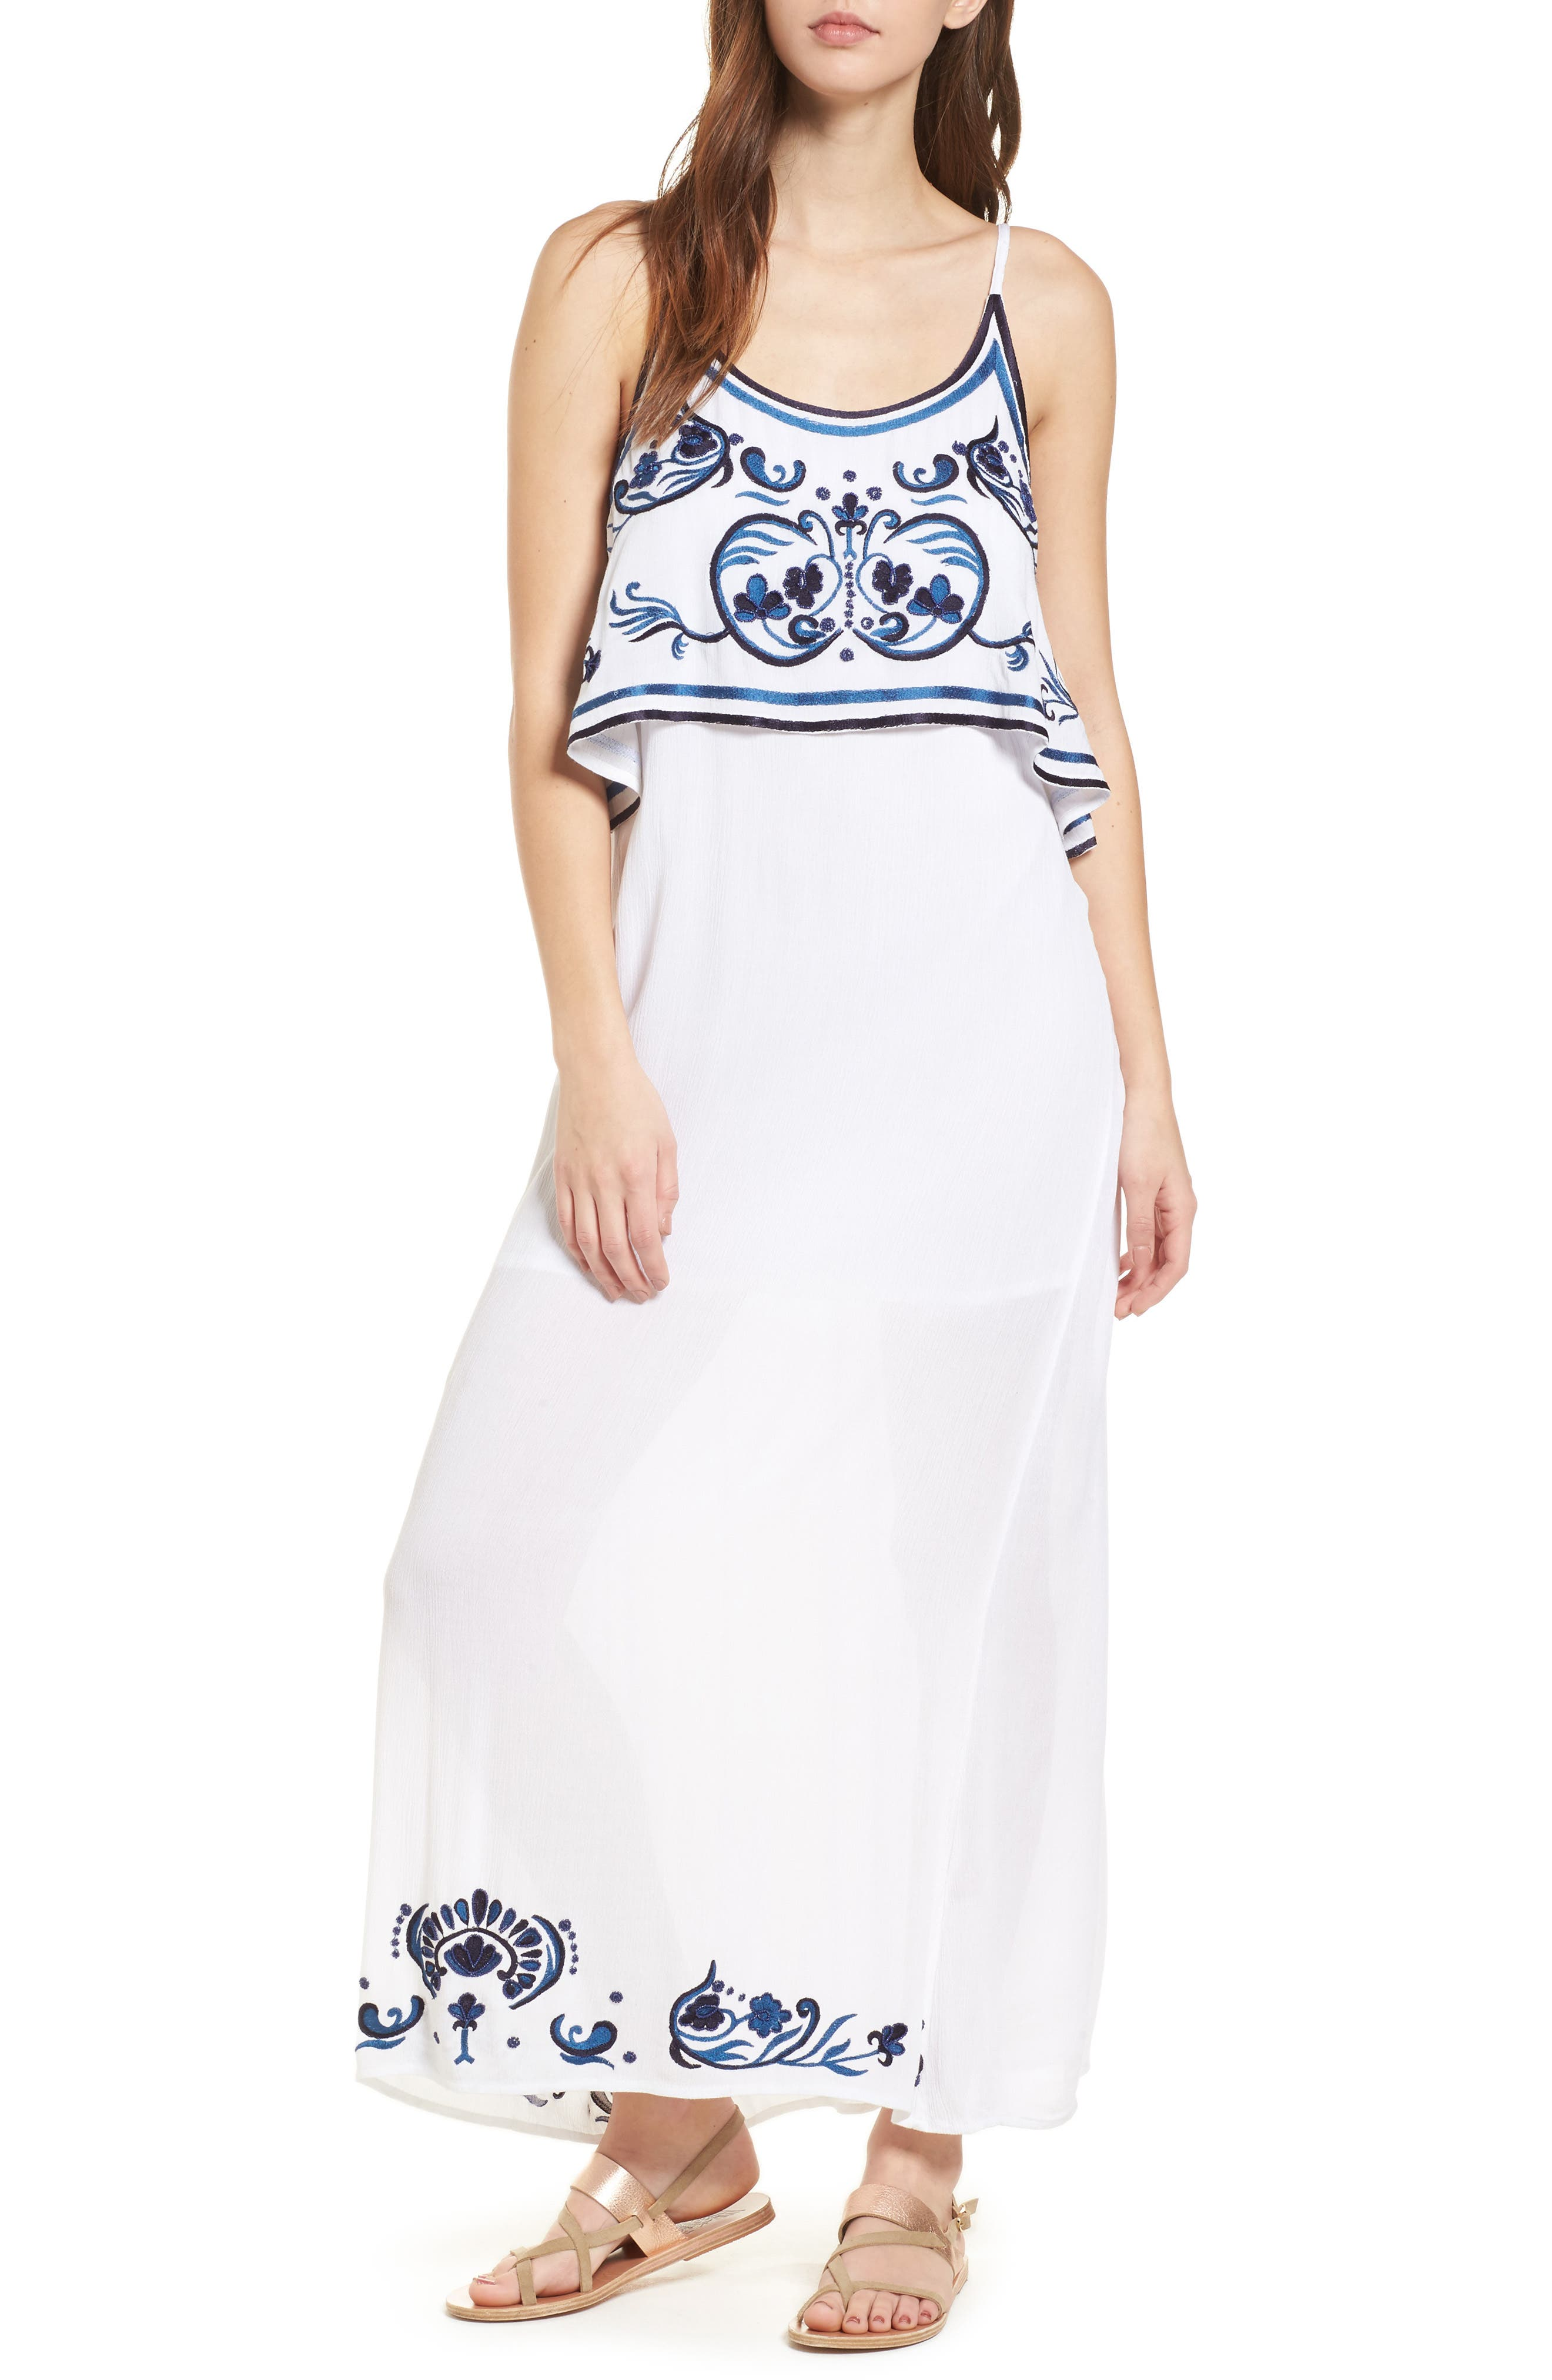 Mediterranean Embroidered Maxi Dress,                             Main thumbnail 1, color,                             100